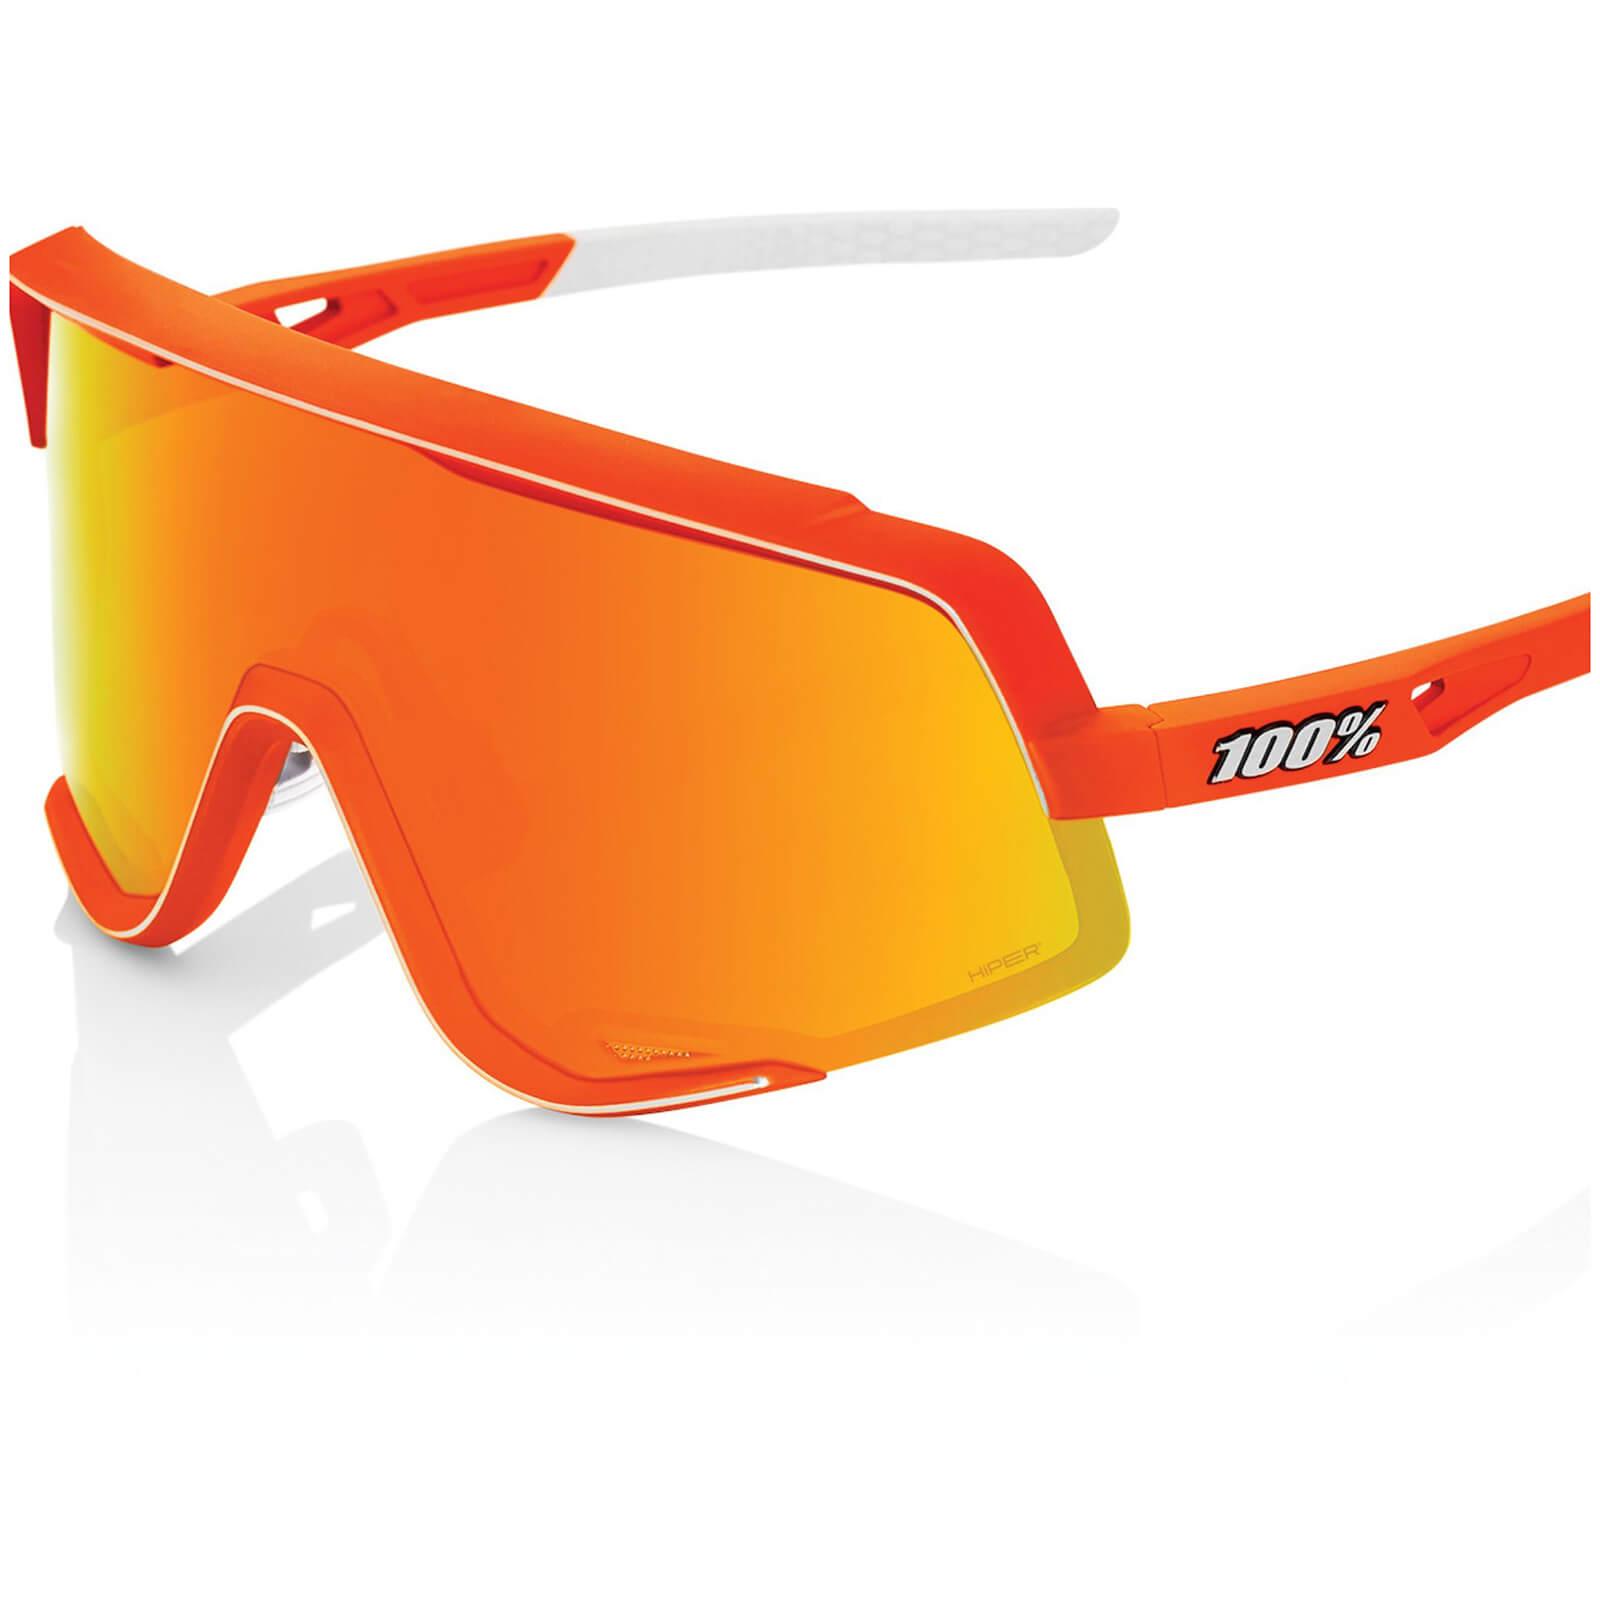 100% S2 Sunglasses With Smoke Lens - Tact Black